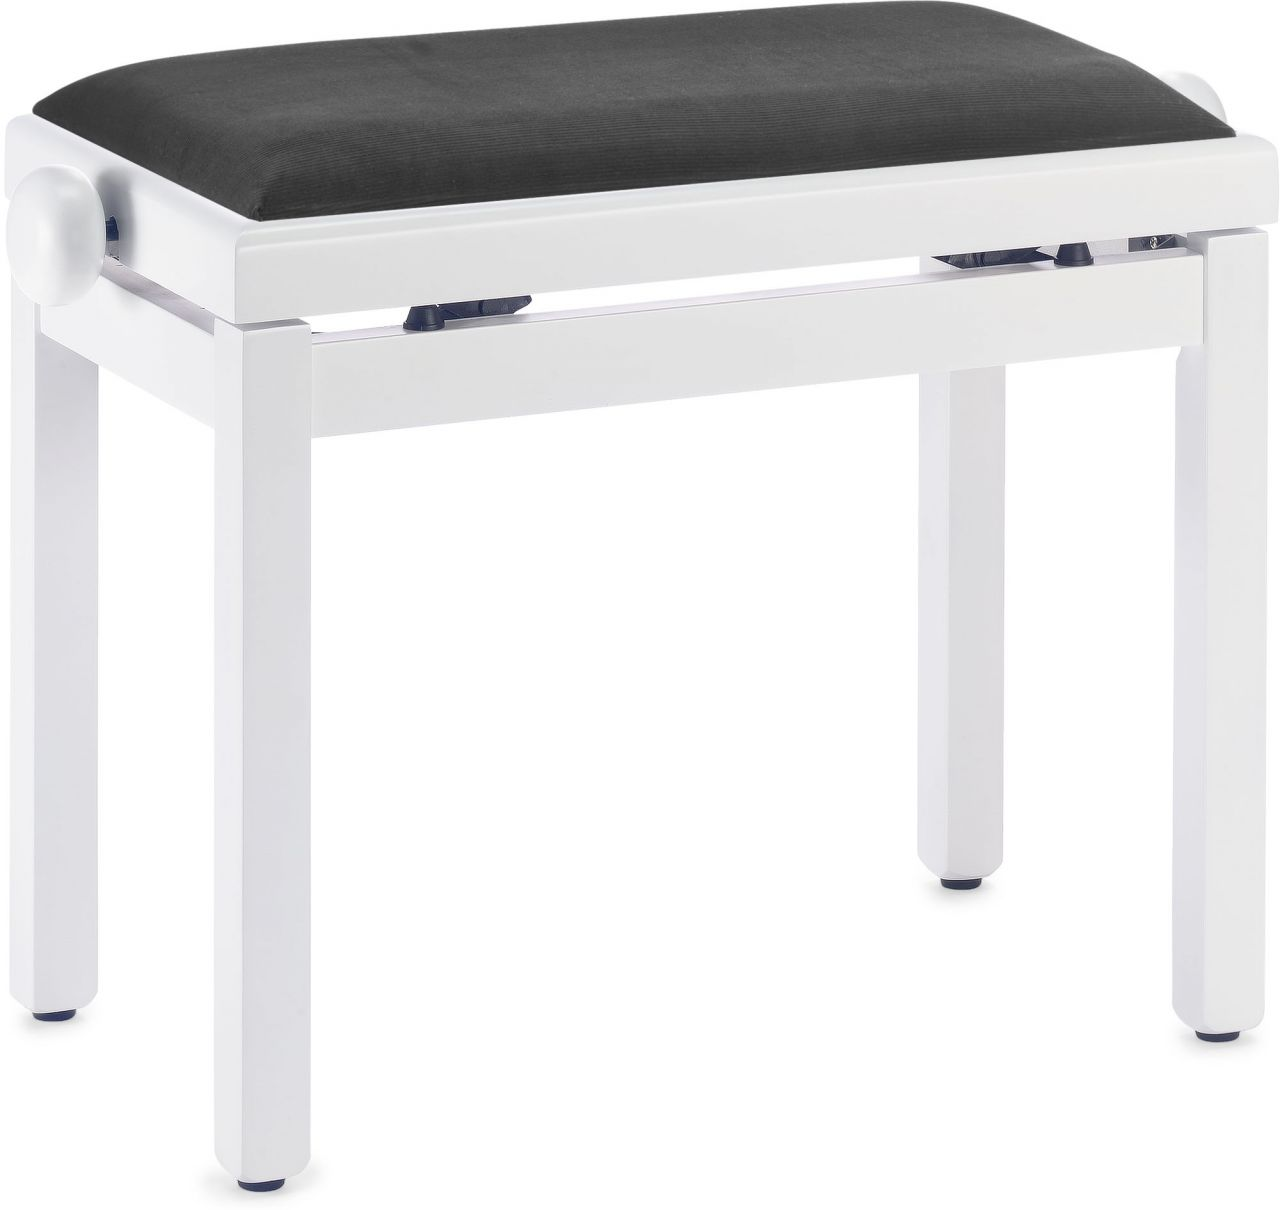 Sonstige Pianobank - Klavierbank - Klavierhocker - weiss matt PB39 WH M V/BK